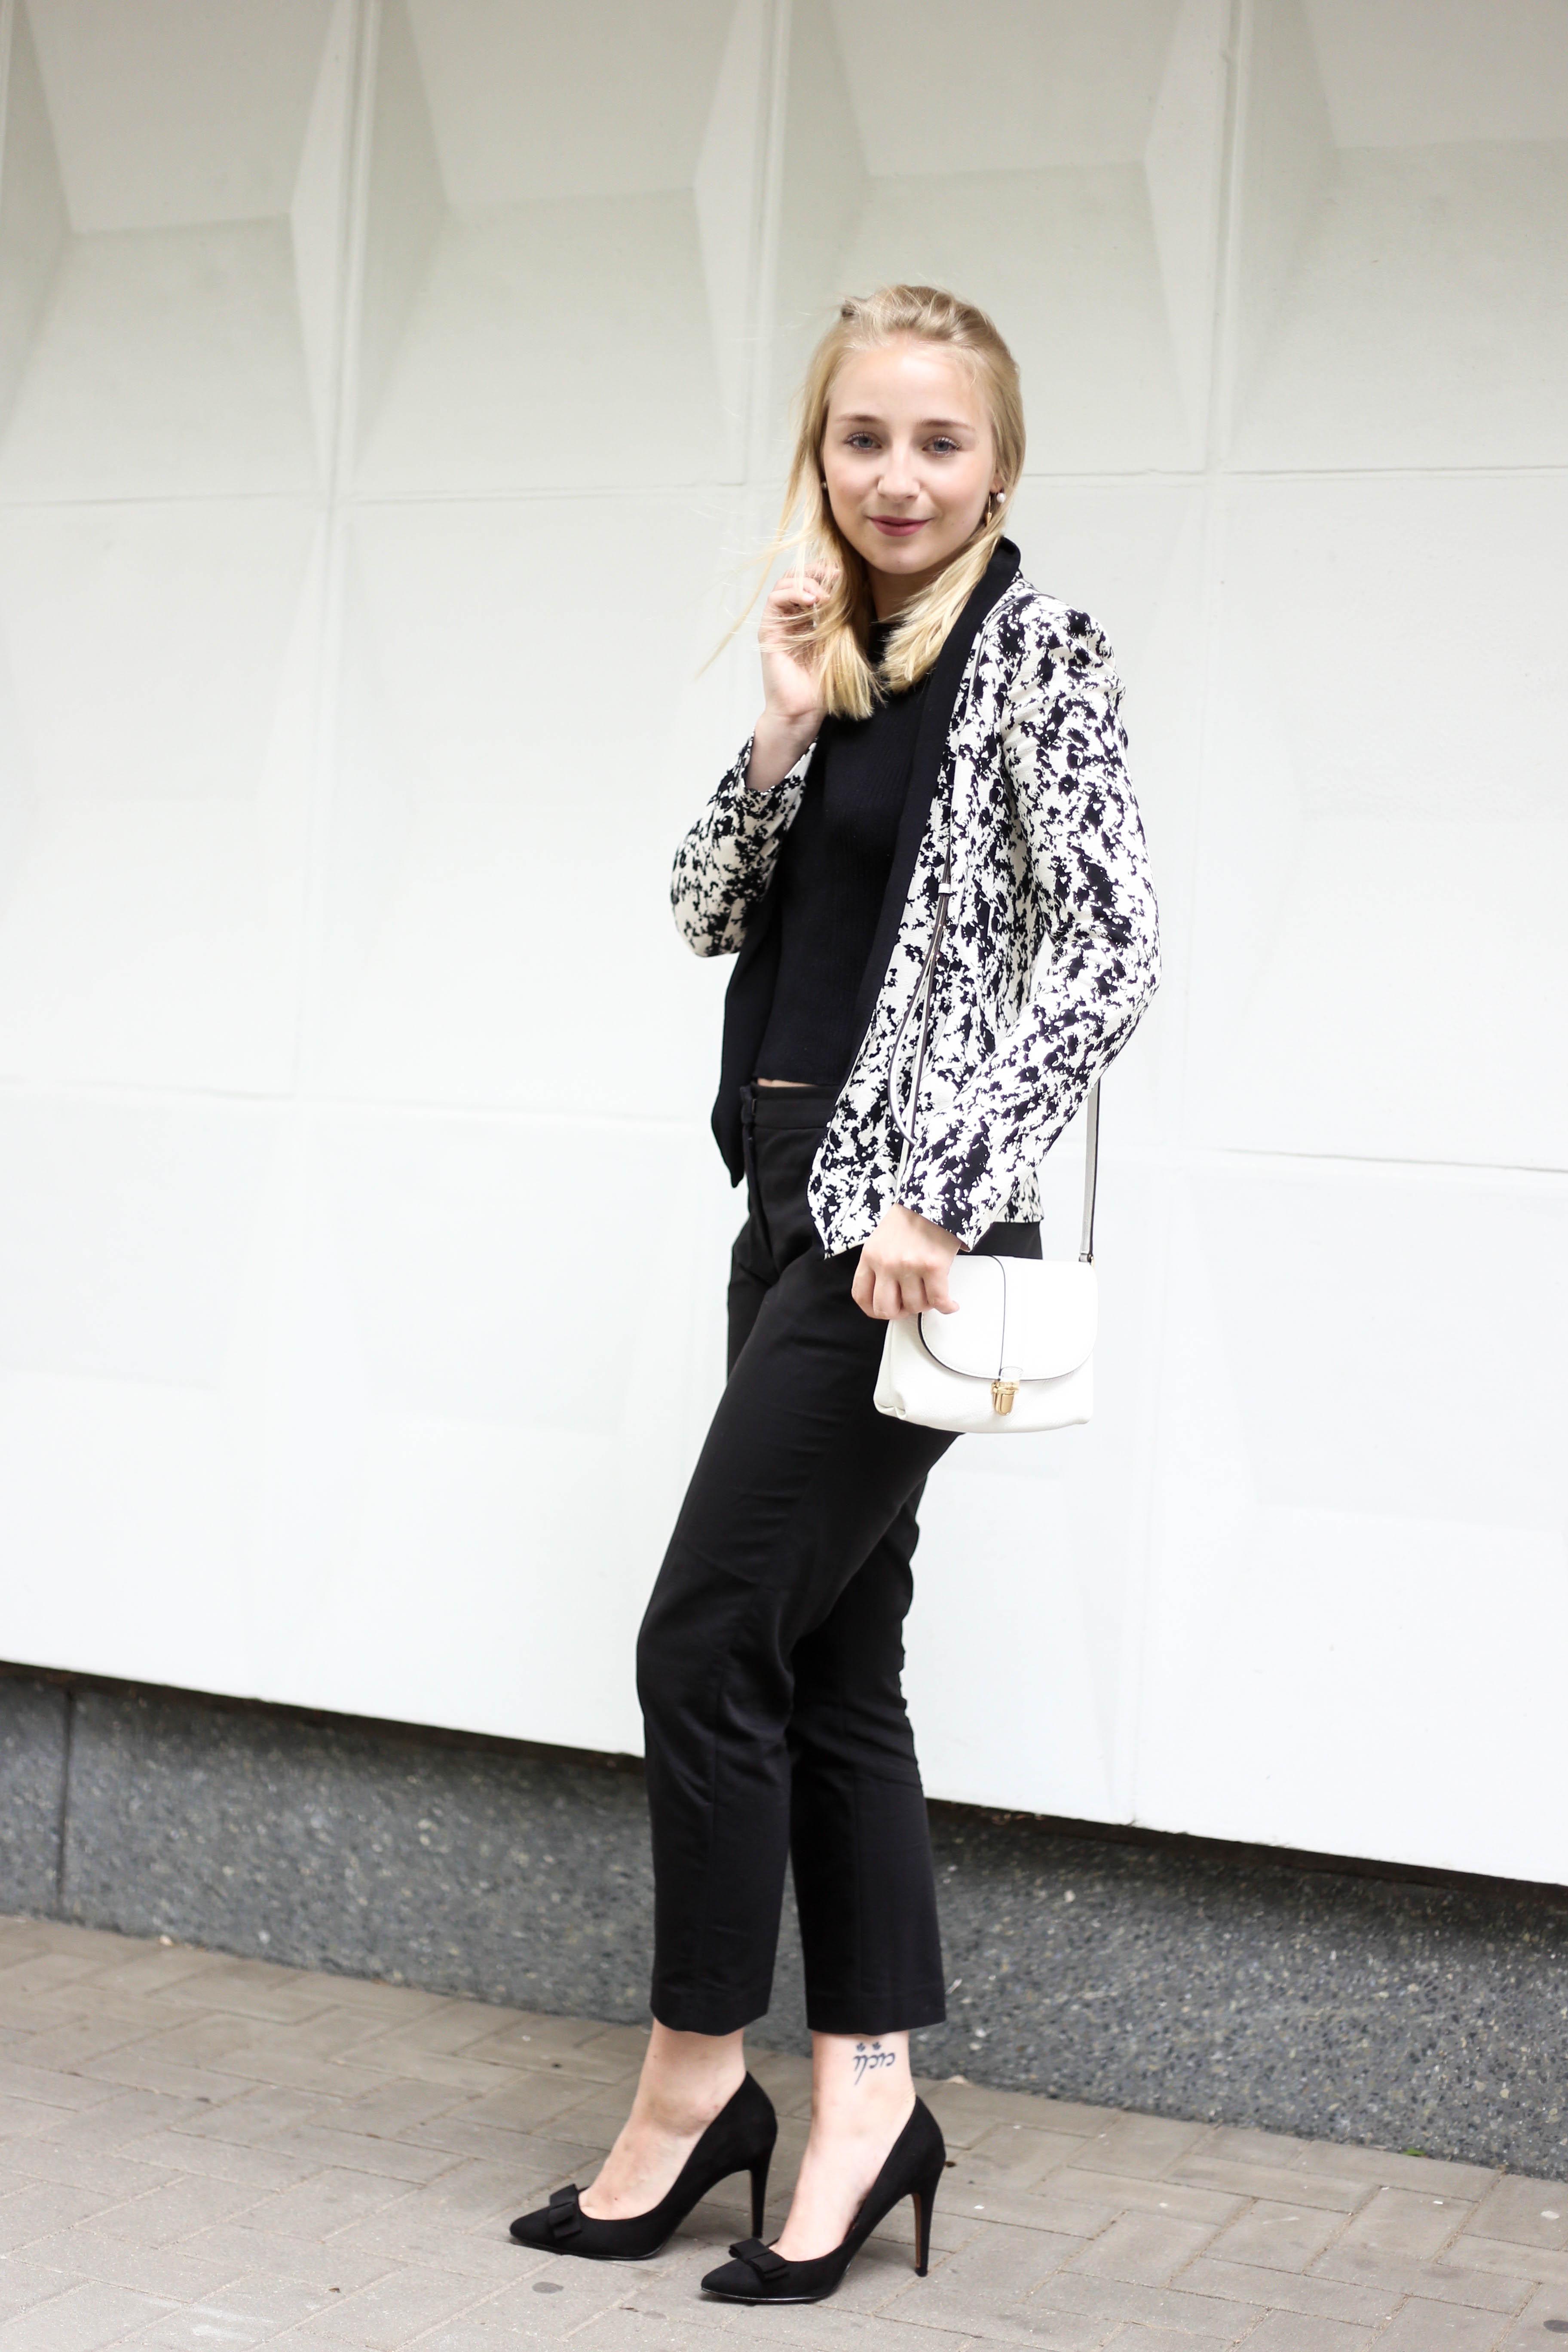 anzugshose-alltag-dalmatiner-blazer-outfit-fashionblog-berlin-köln_2001